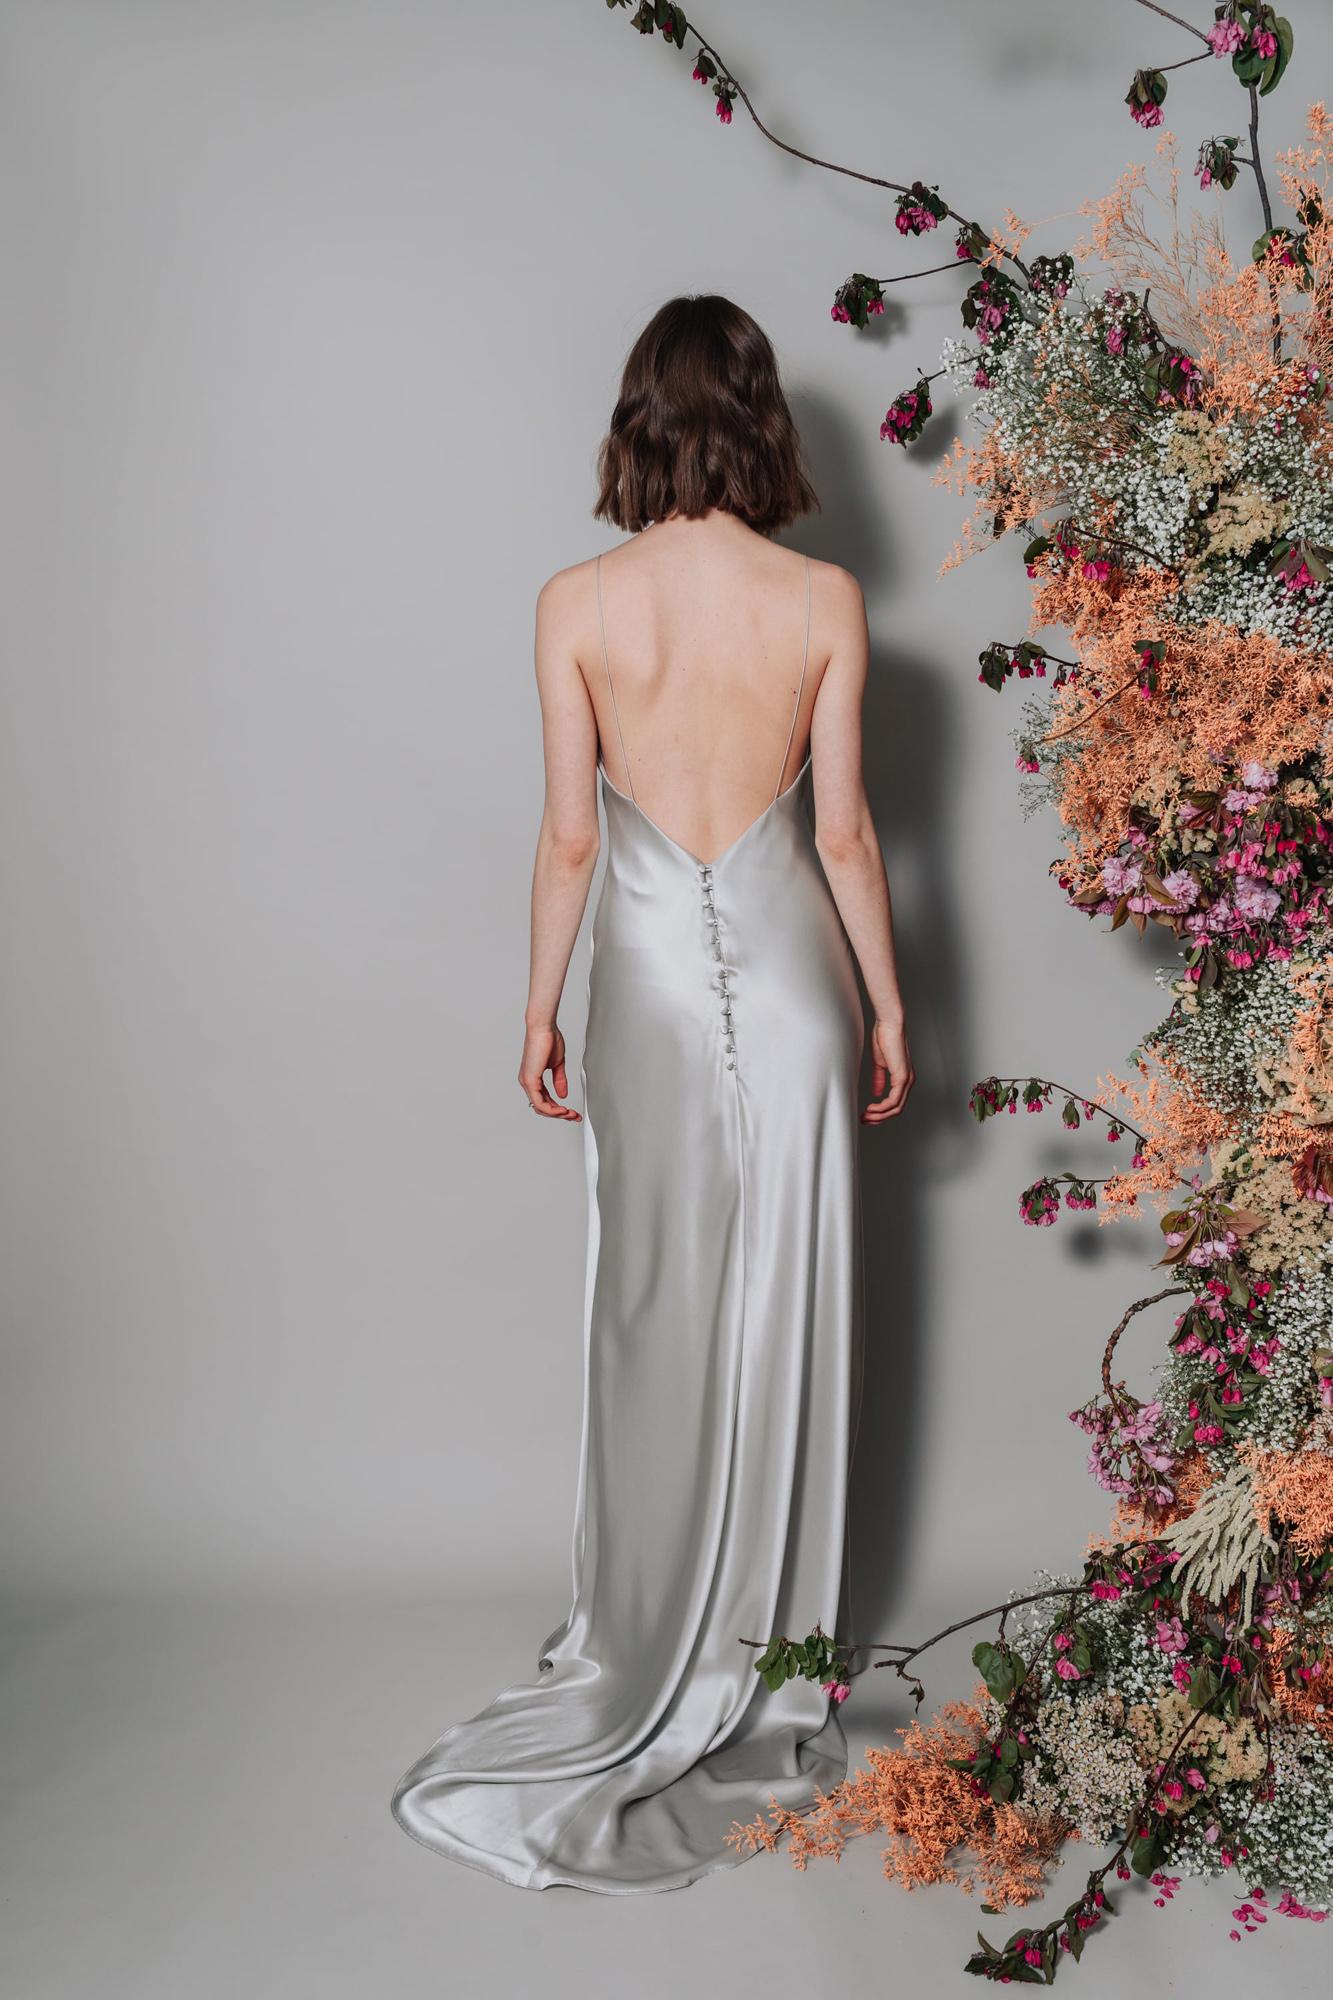 Kate-Beaumont-Sheffield-Cosmos-Minimal-Modern-Silver-Silk-Slip-Wedding-Dress-8.jpg